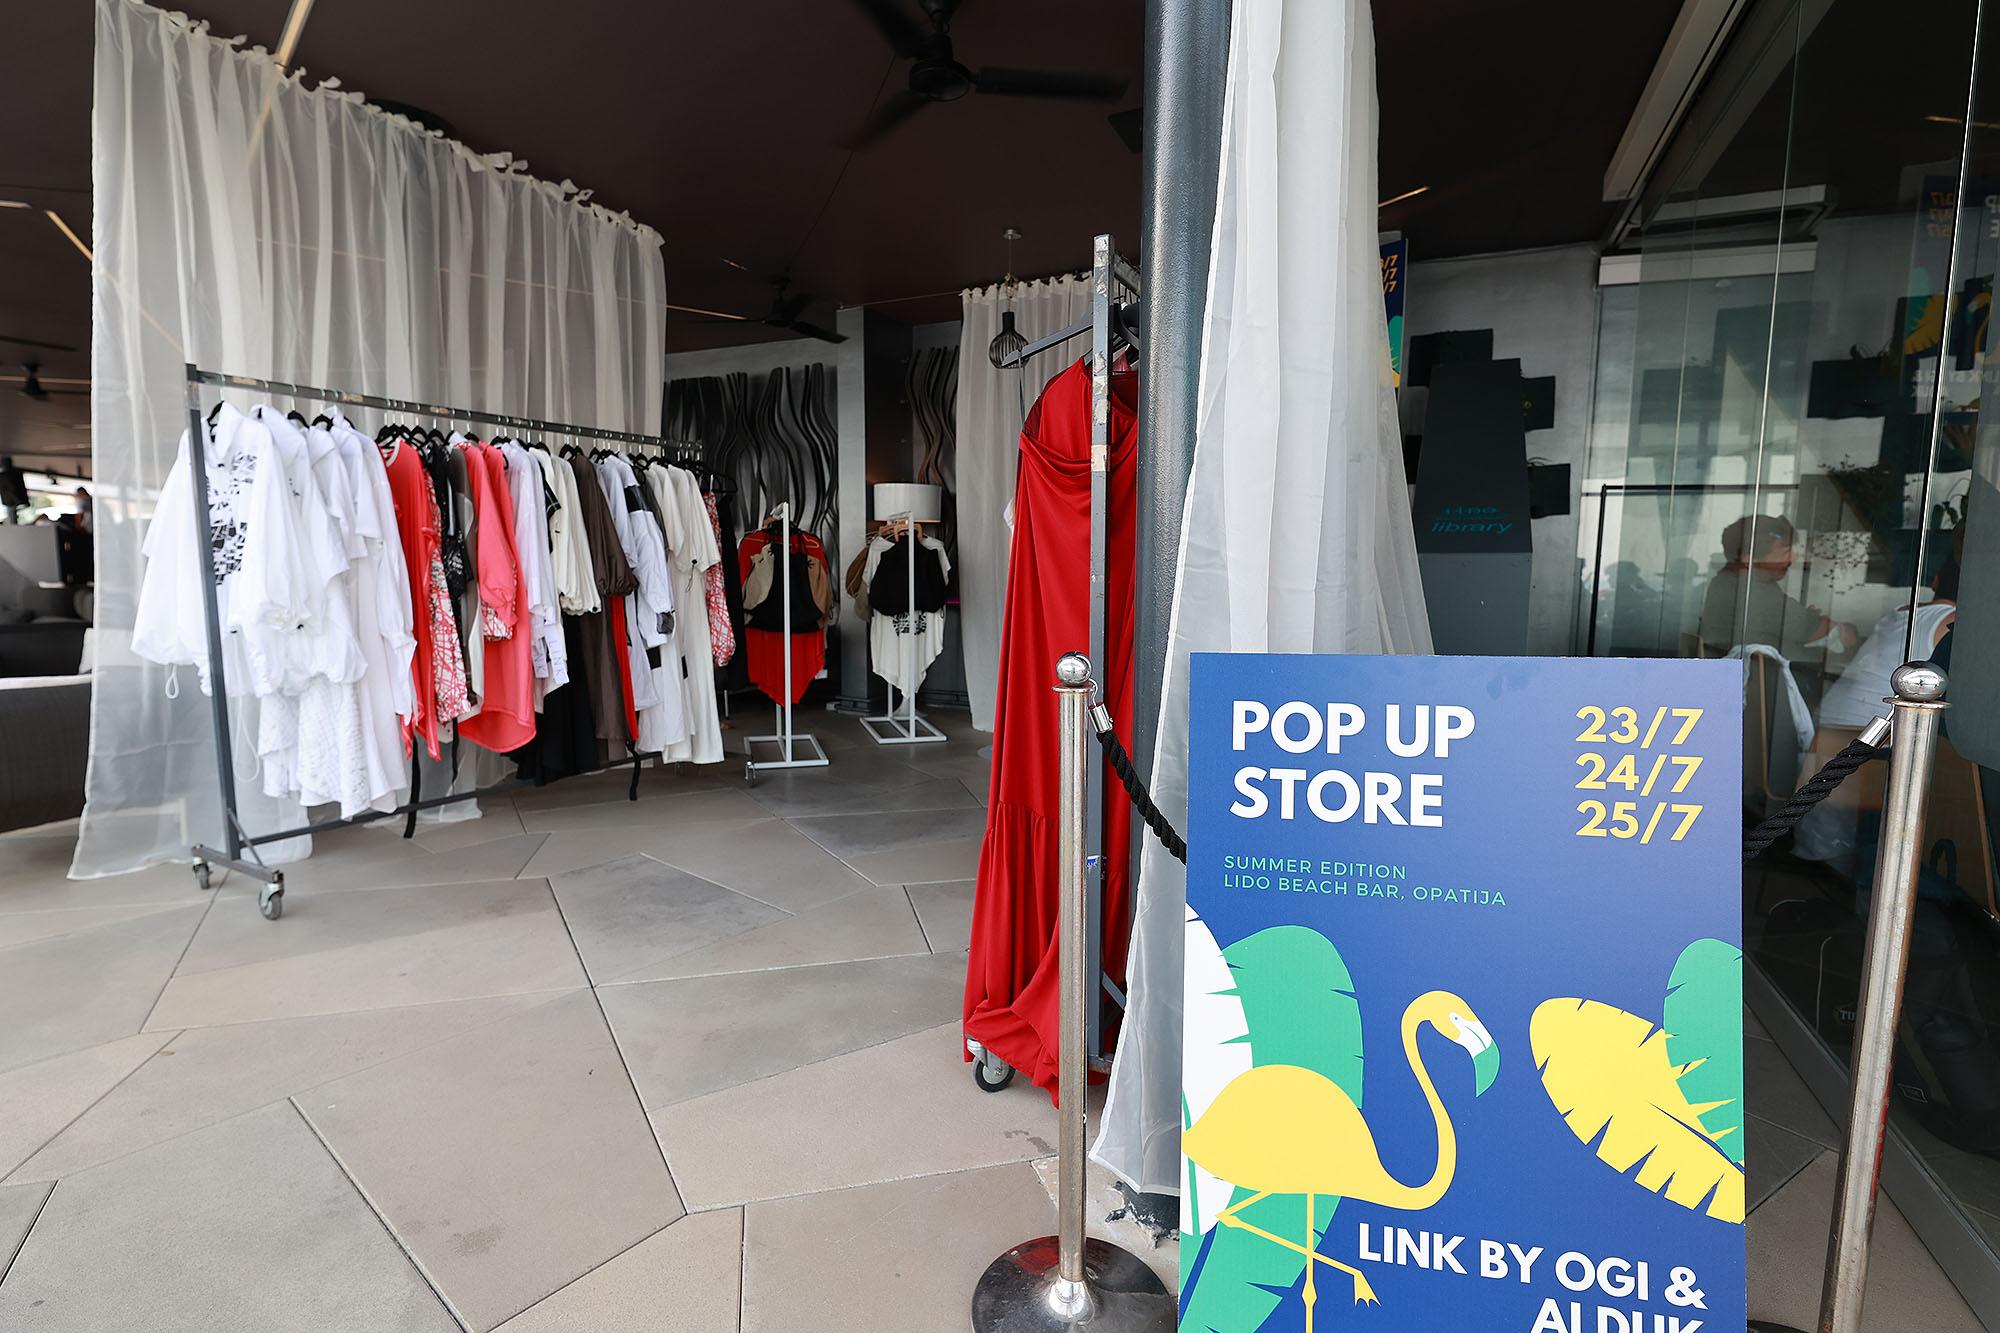 Jučer se otvorio LINK by Ogi i Alduk DESIGN POP UP STORE u Opatiji